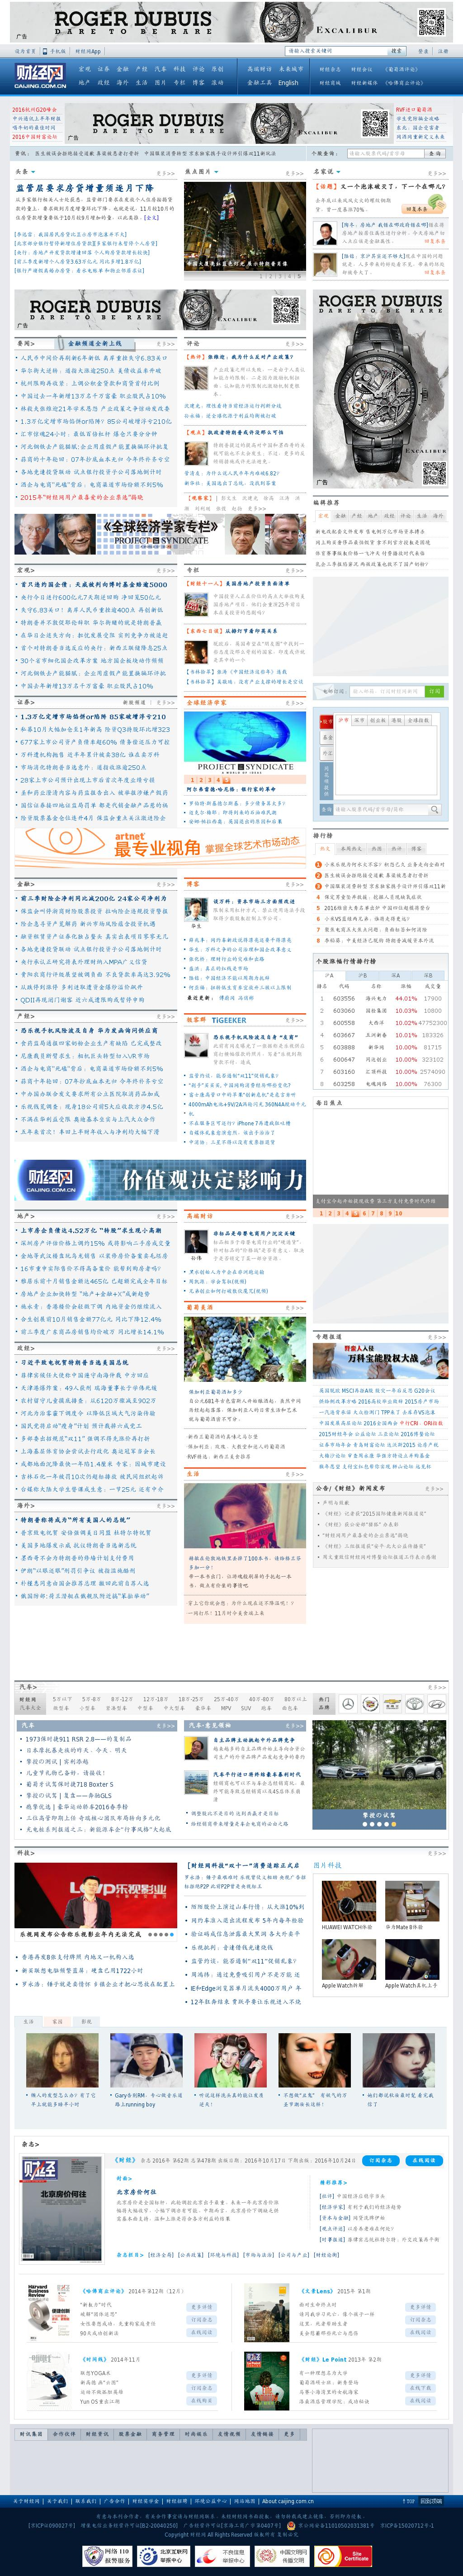 Caijing at Thursday Nov. 10, 2016, 3:02 a.m. UTC